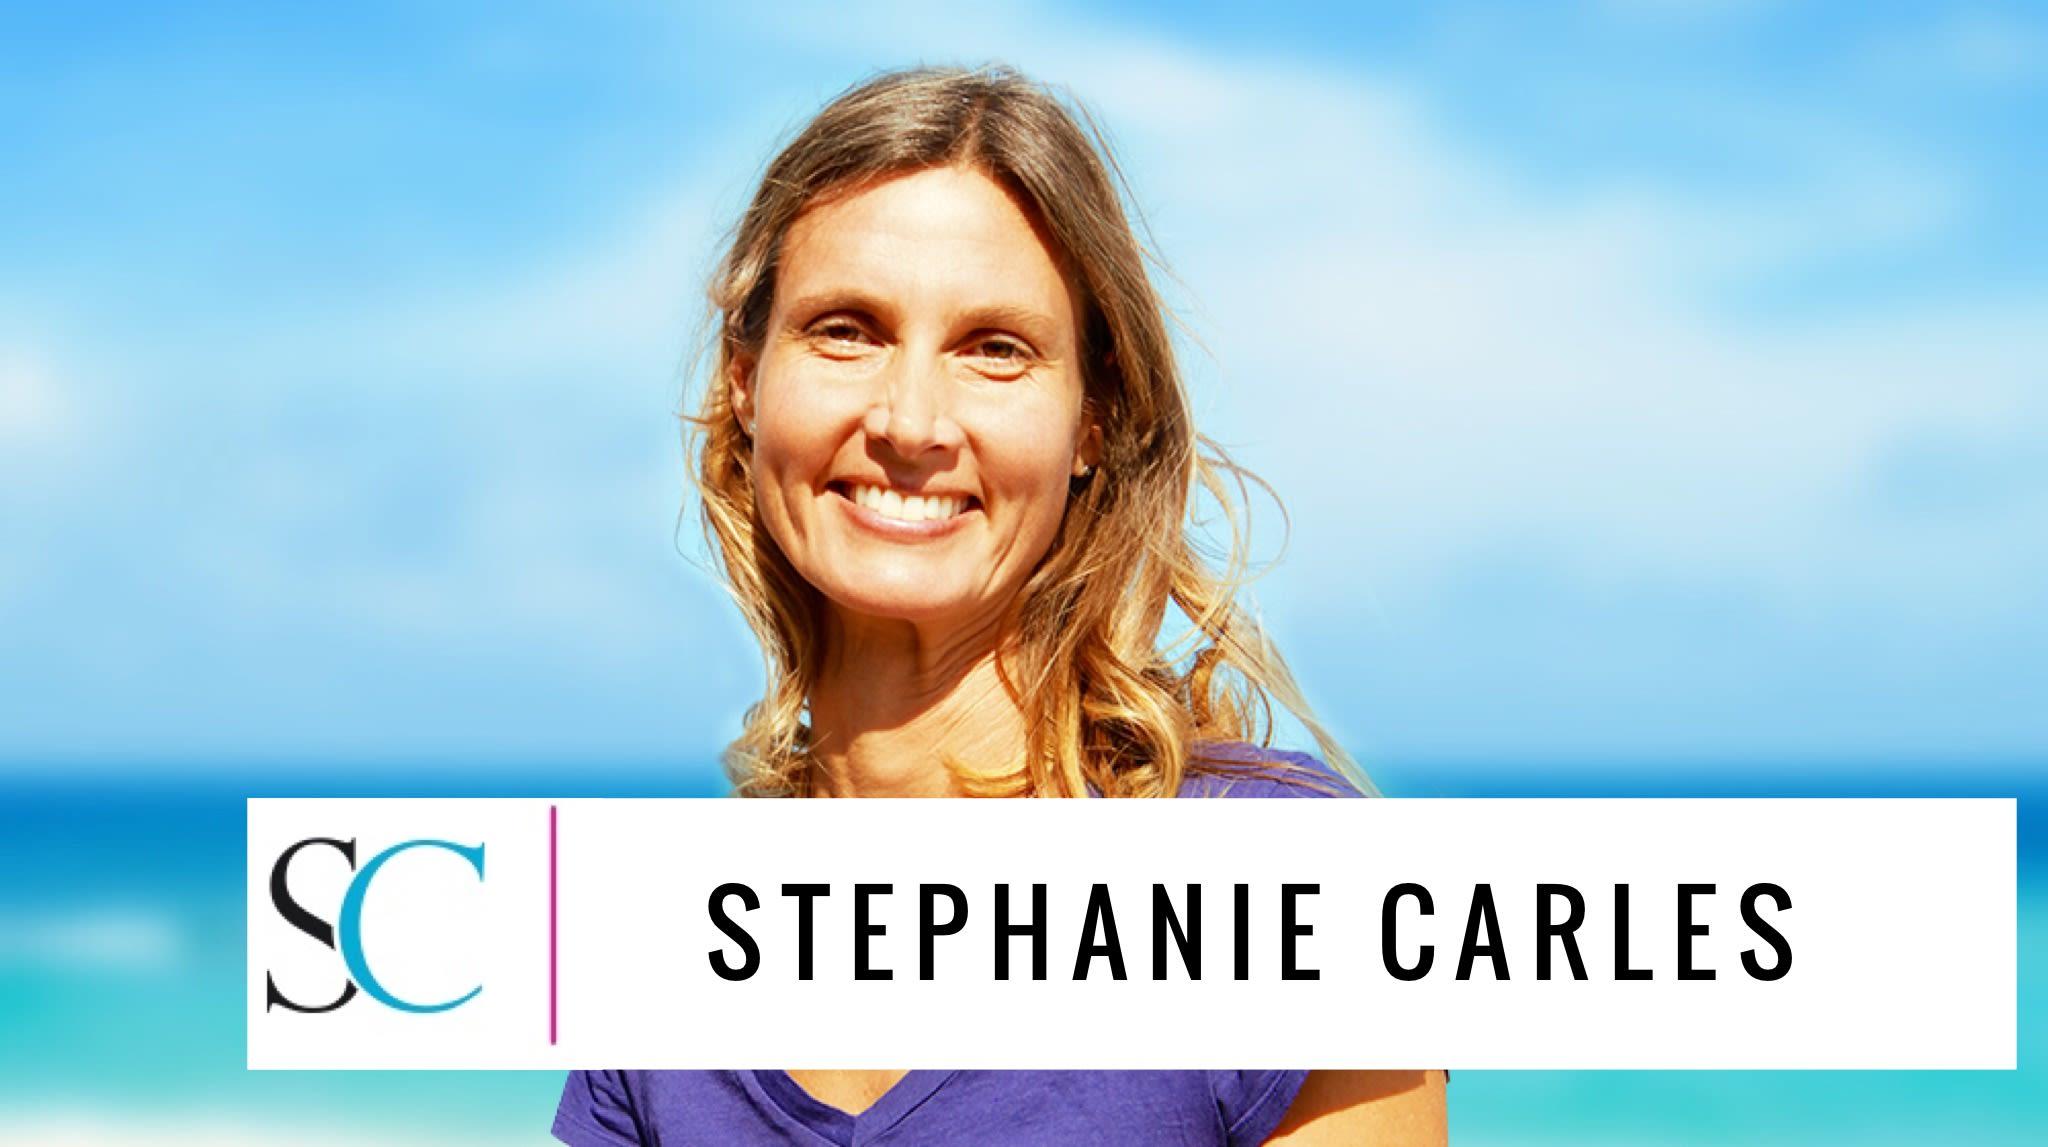 Stephanie Carles